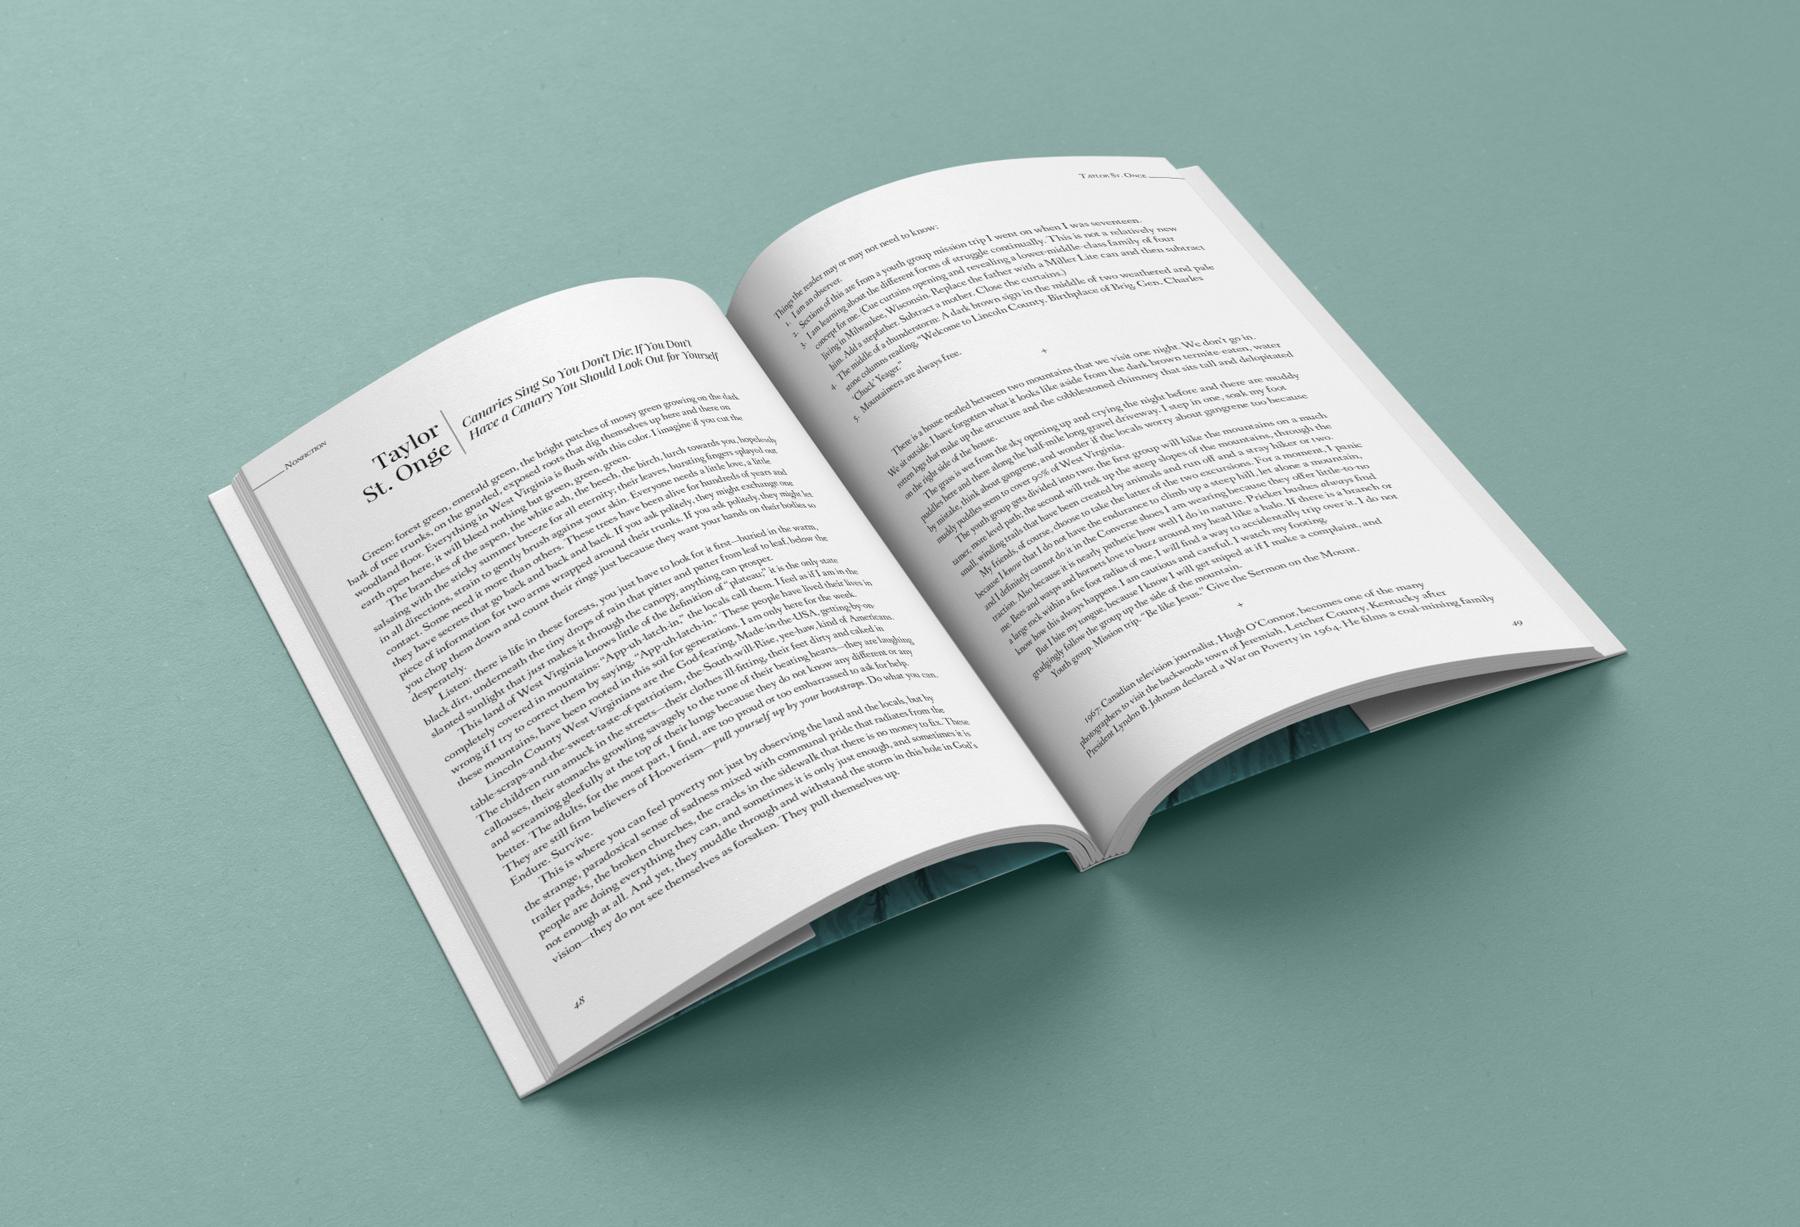 HABITAT-MAG_Book_Mockup_6.jpg